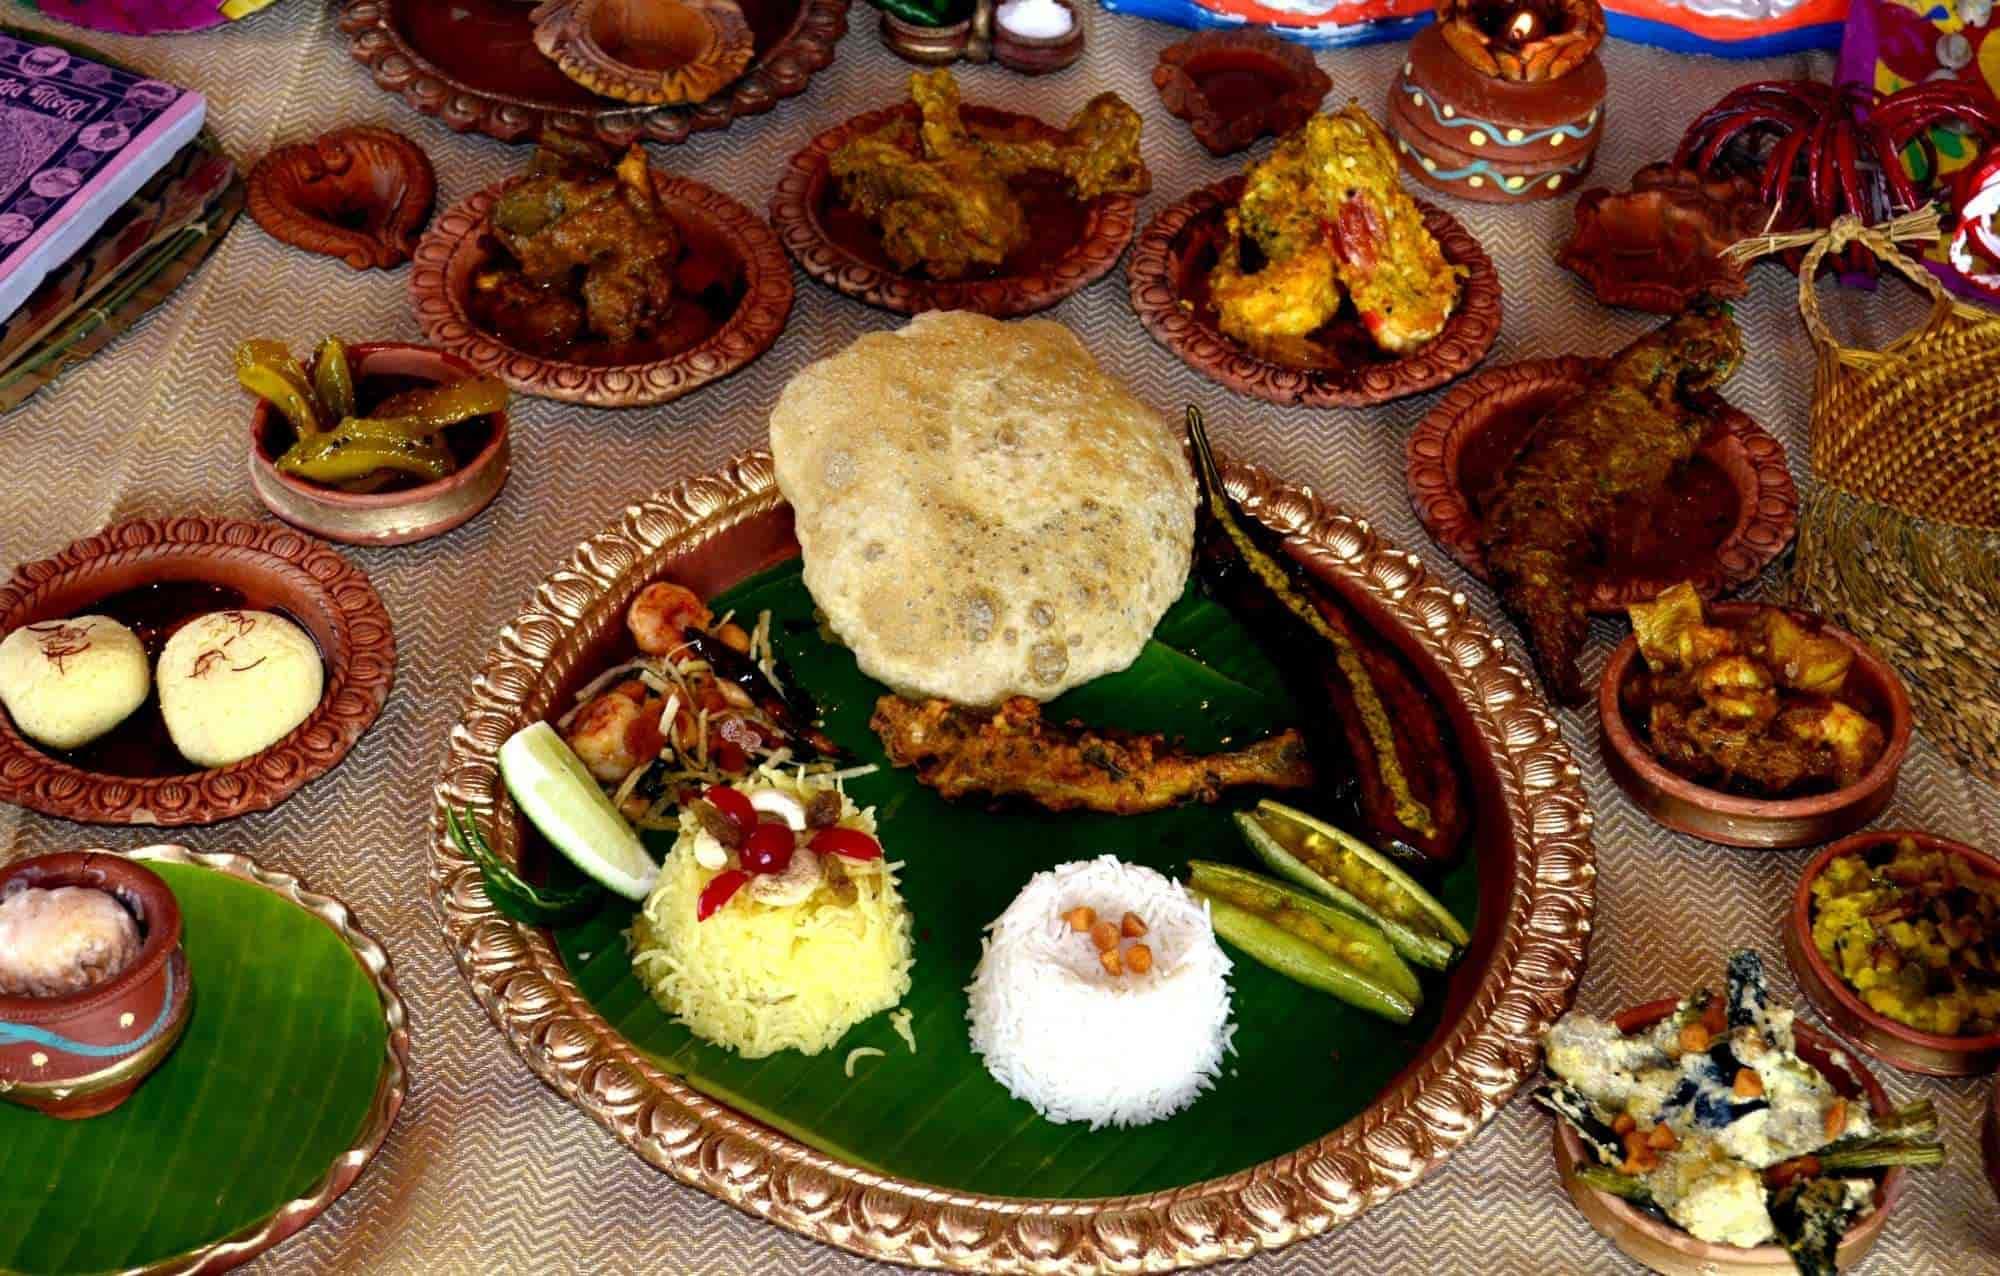 Nababarsher Maha Bhoj Charnocks Restaurant Bar Photos Salt Lake City Sector 4